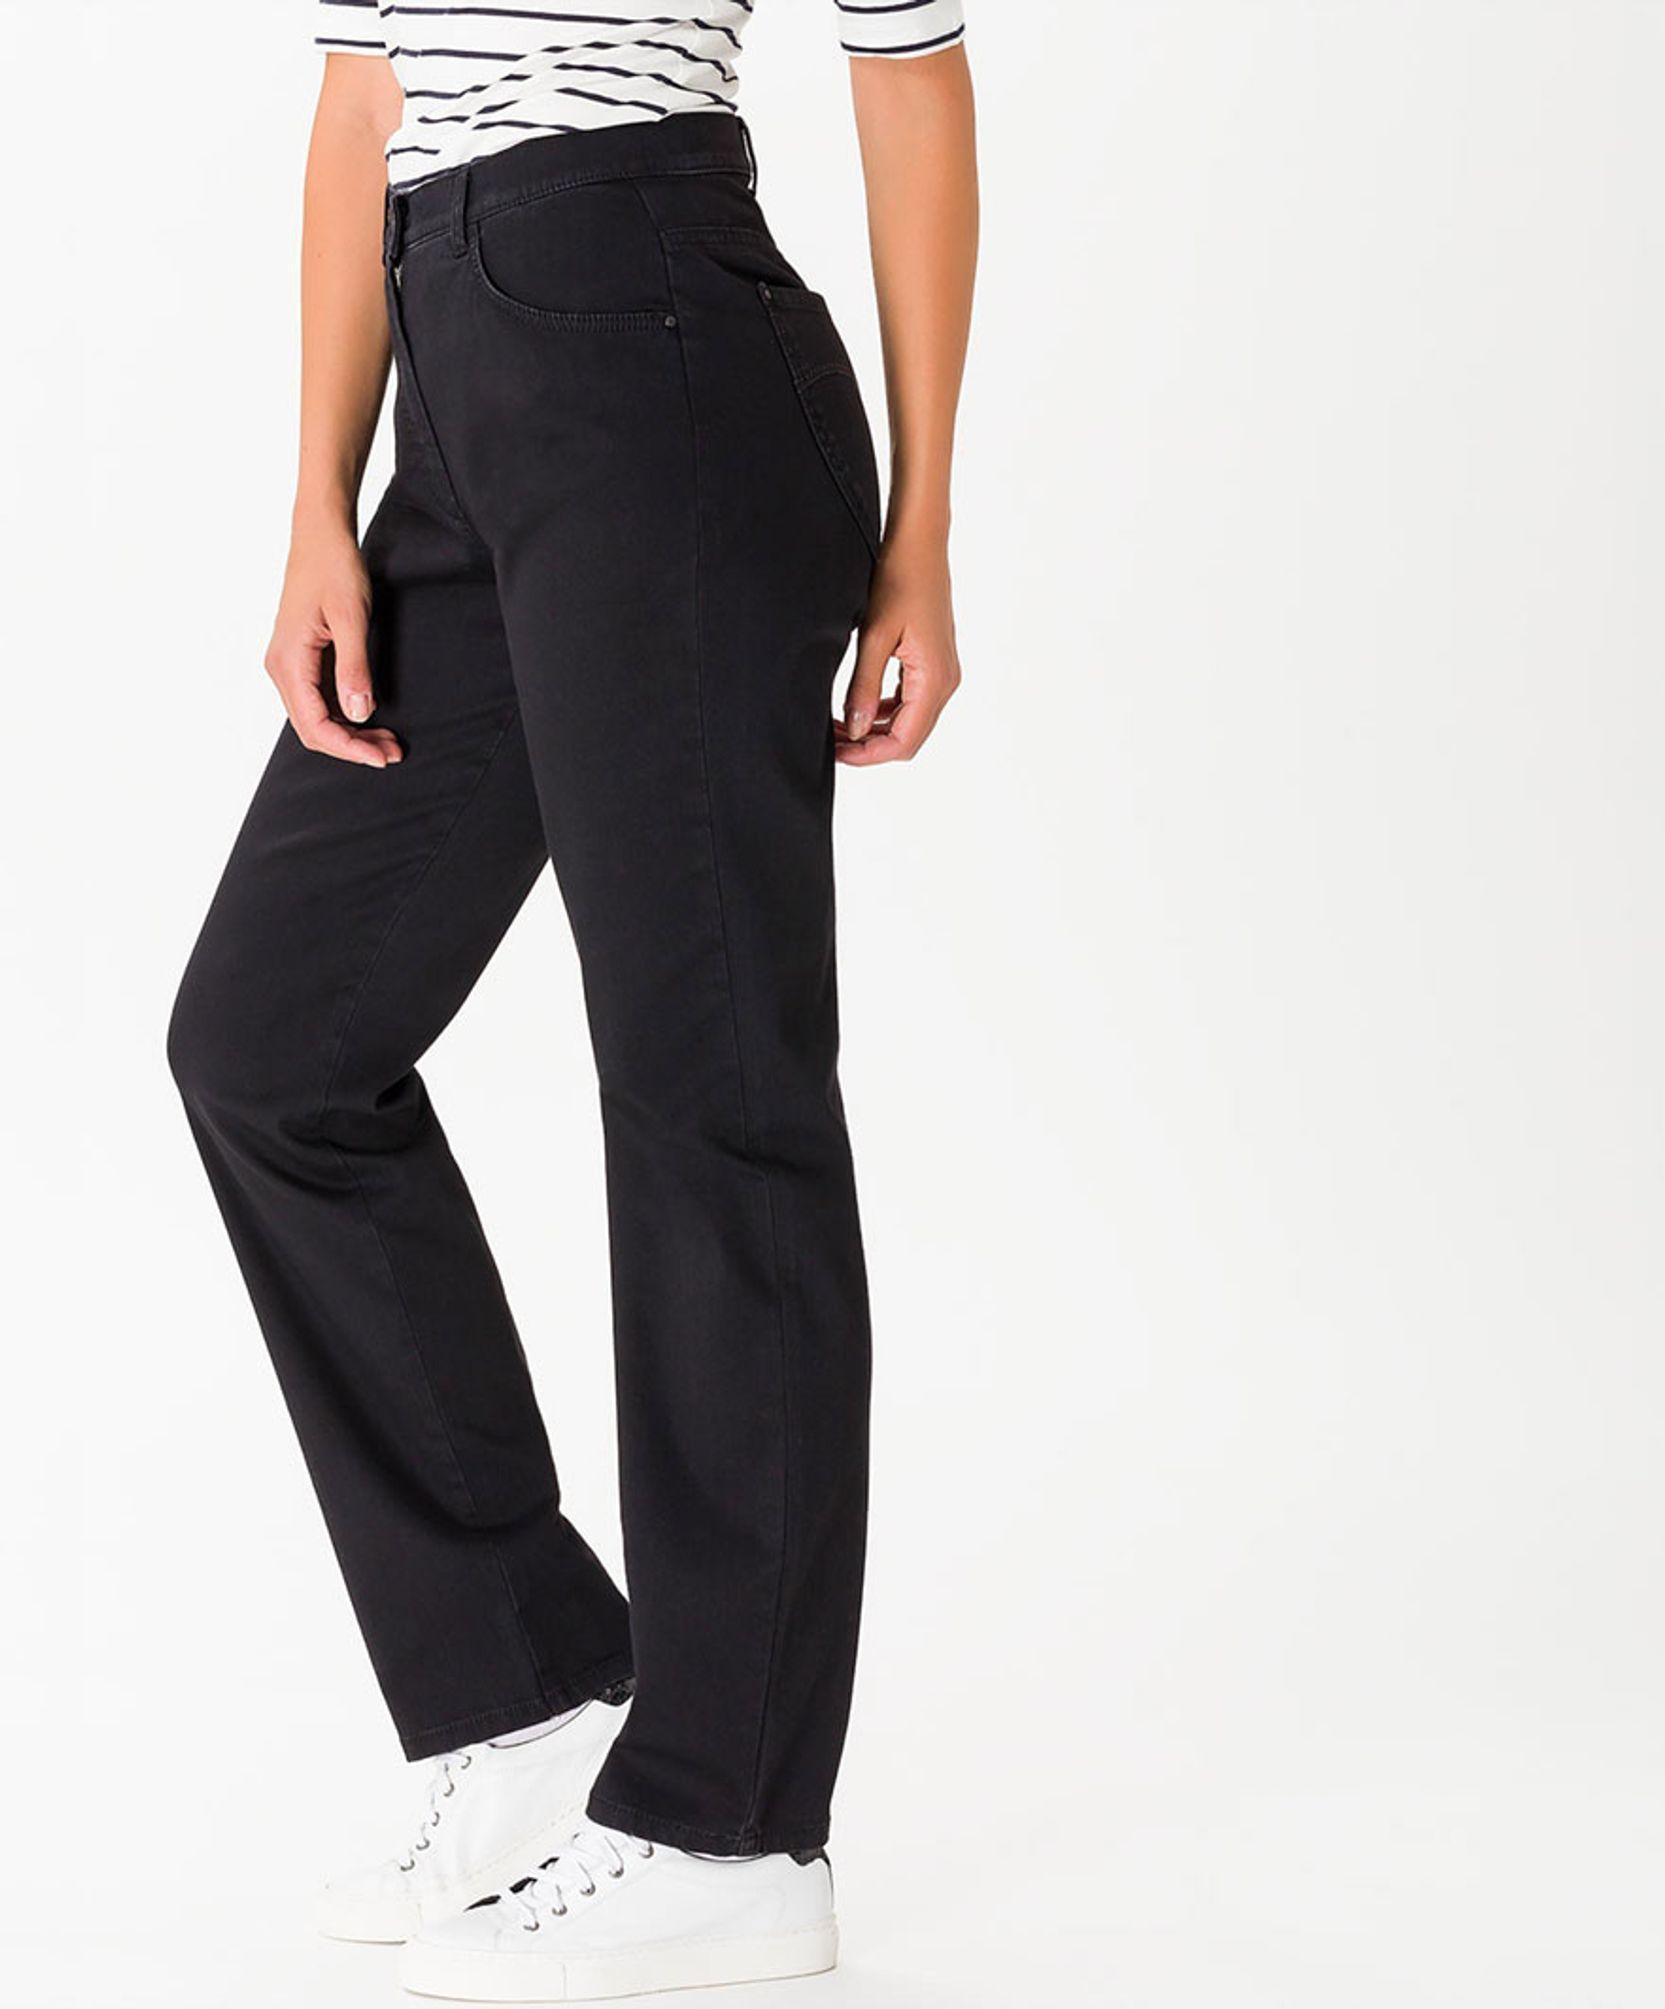 Raphaela by Brax Damen Corry FAY Straight Jeans, Blau (Dark